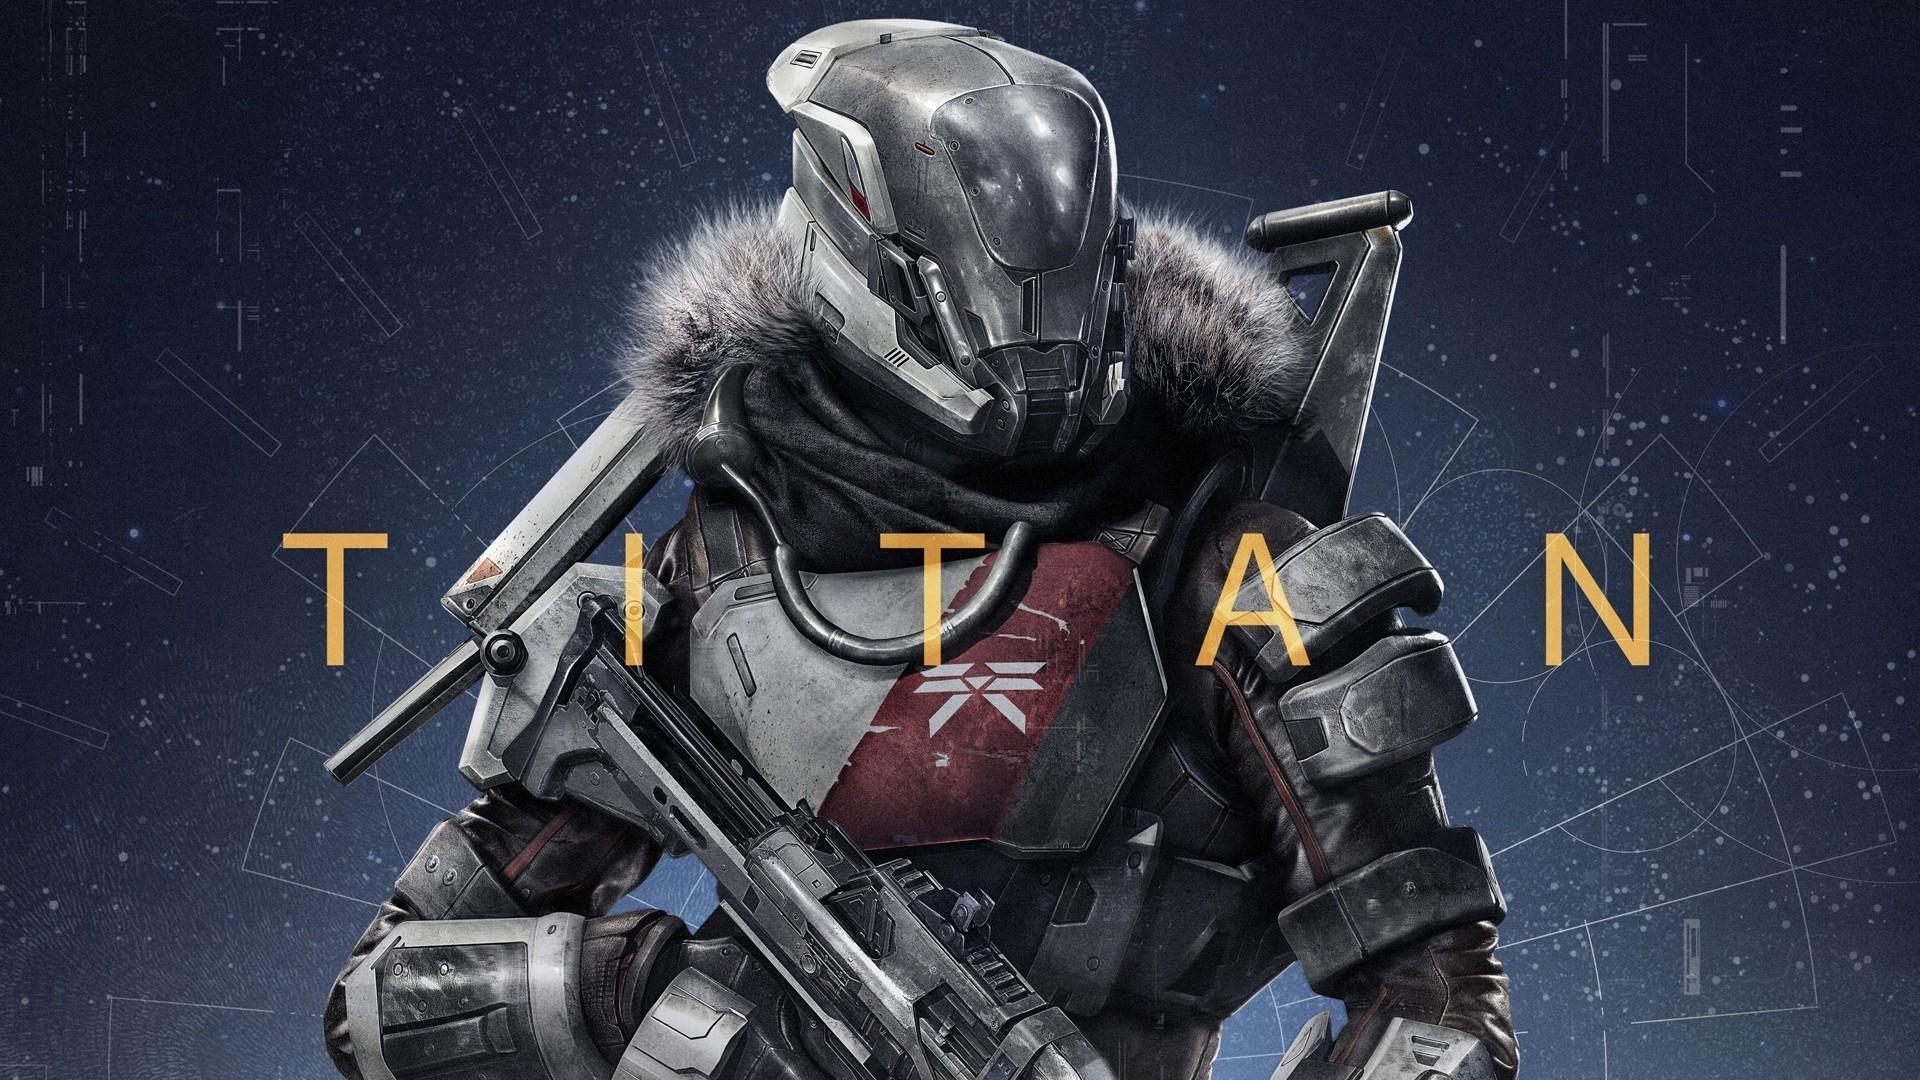 Destiny Titan Wallpaper Download Free Amazing High Resolution